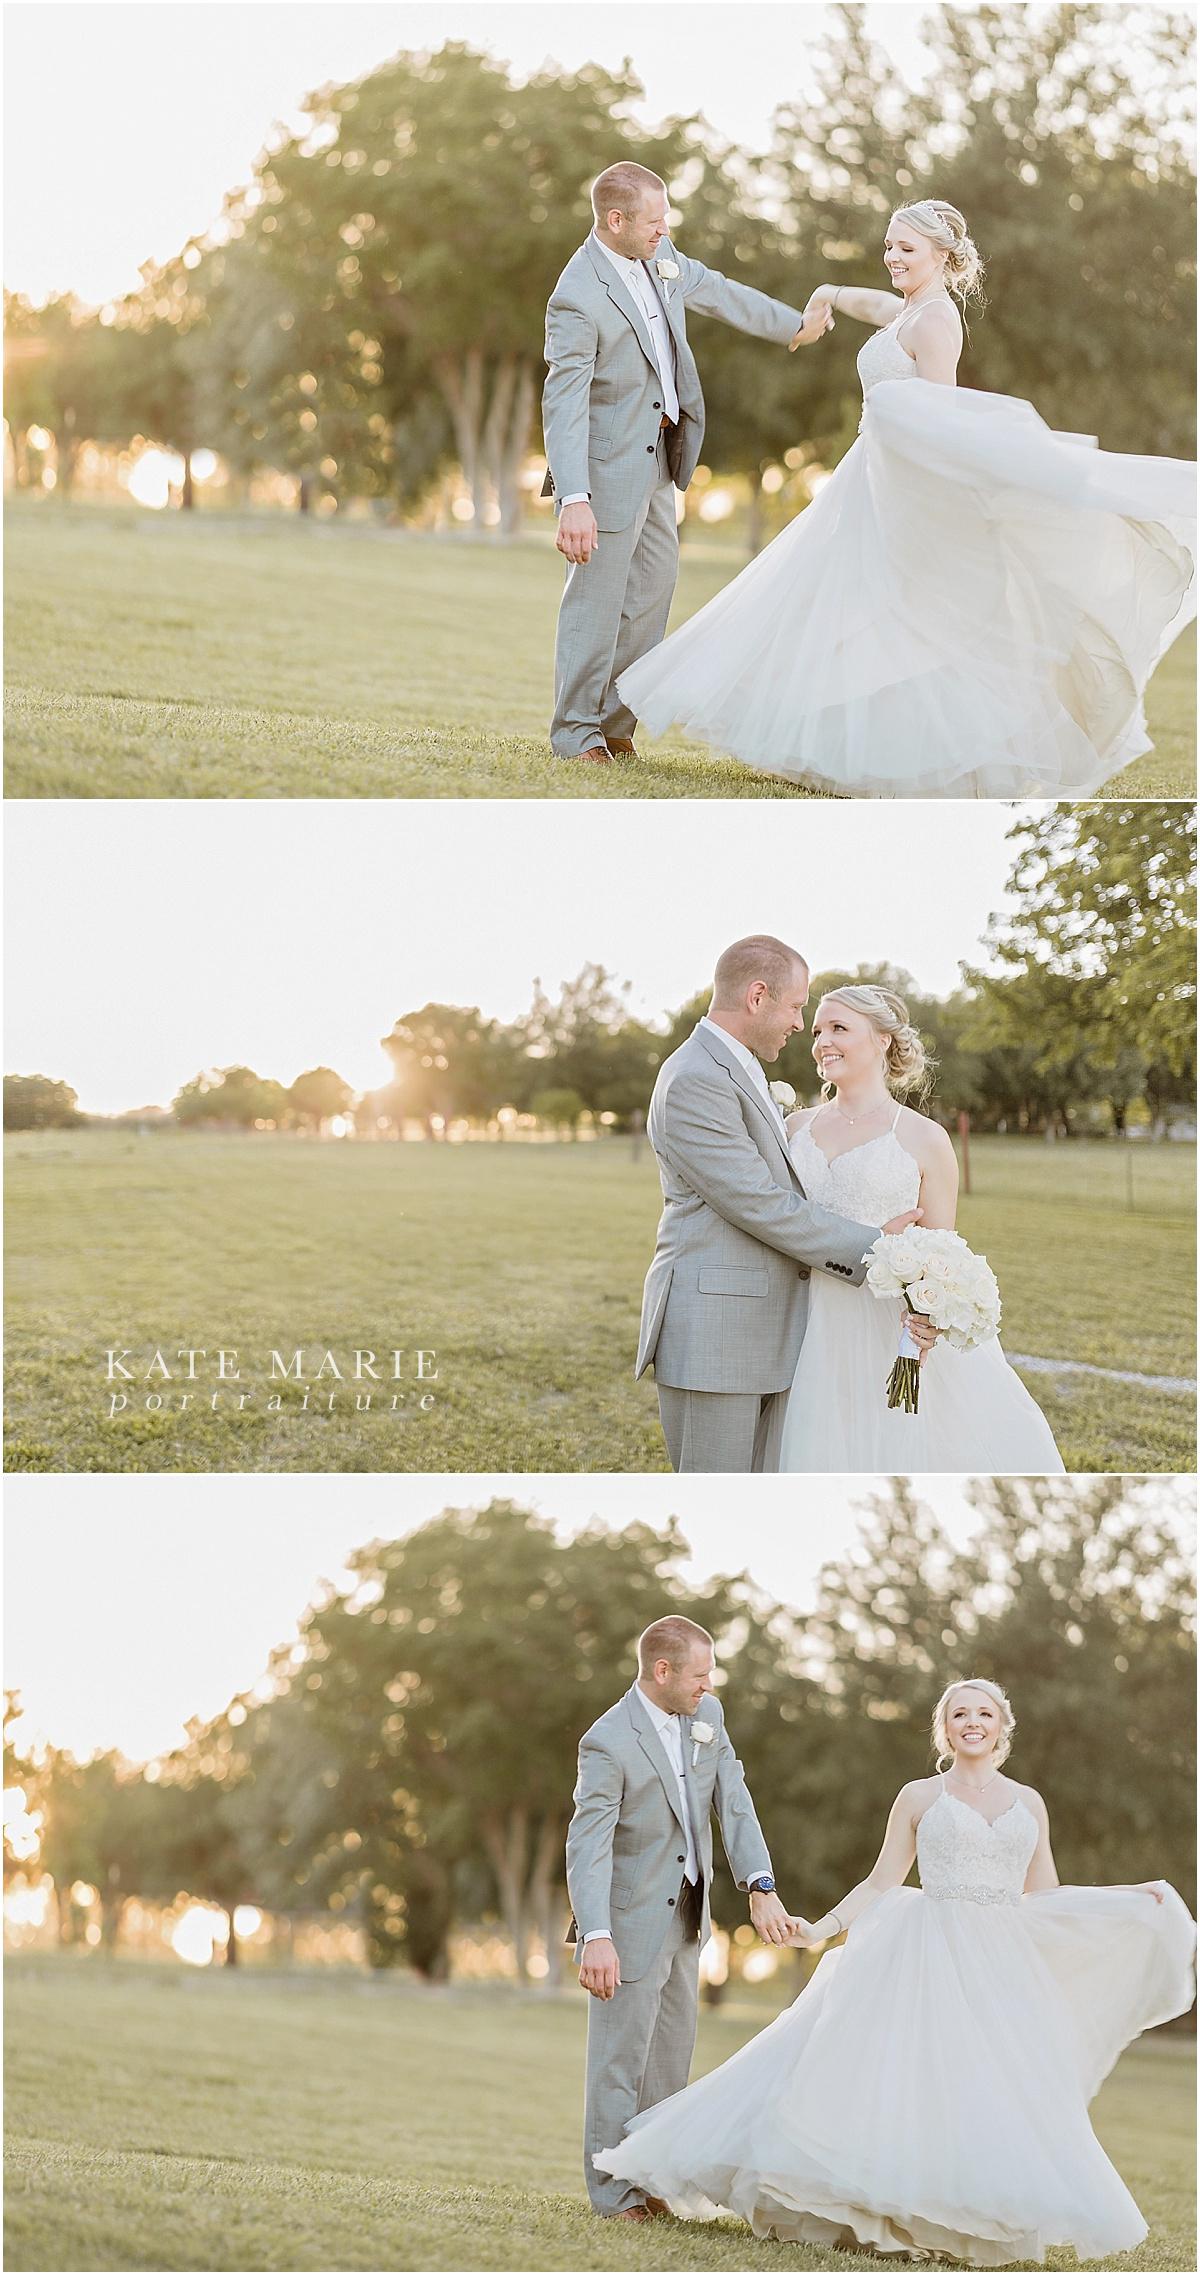 Dallas_Wedding_Photographer_Flower_Mound_Portrait_Photographer_Kate_Marie_Portraiture_Ashley&Ryan_RusticGraceEstate_12.jpg